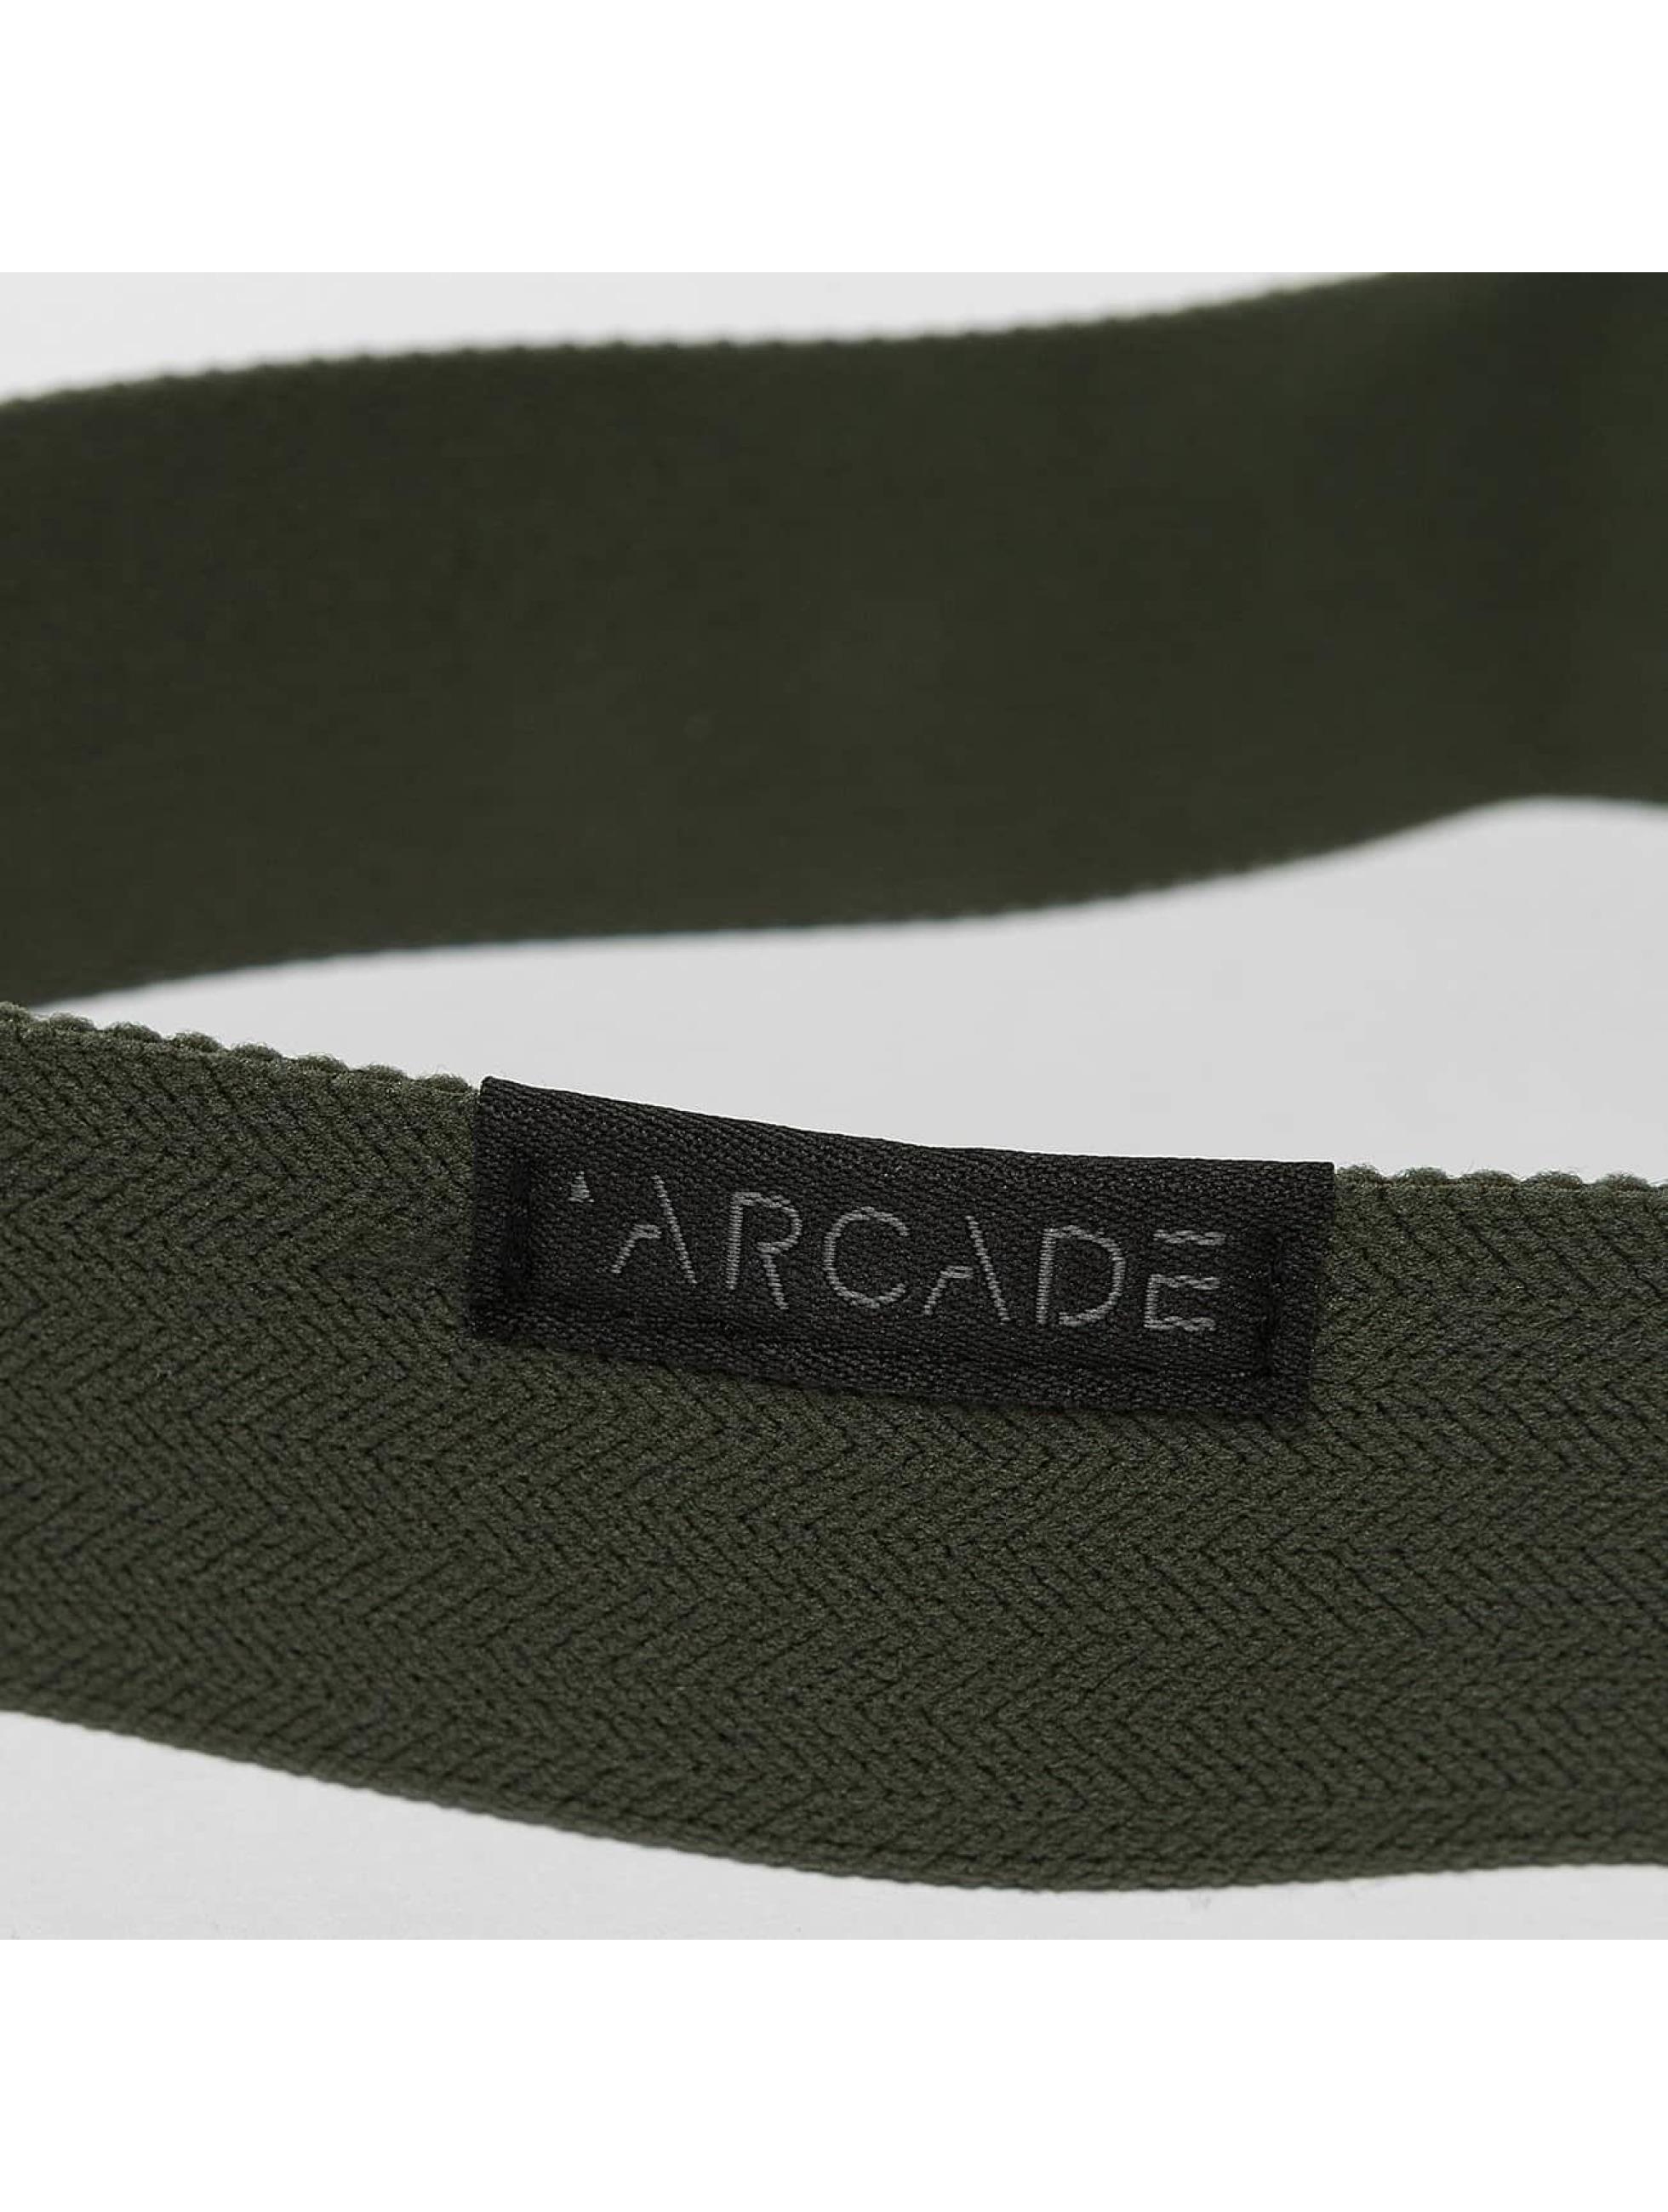 ARCADE Bælte Core Collection Ranger oliven